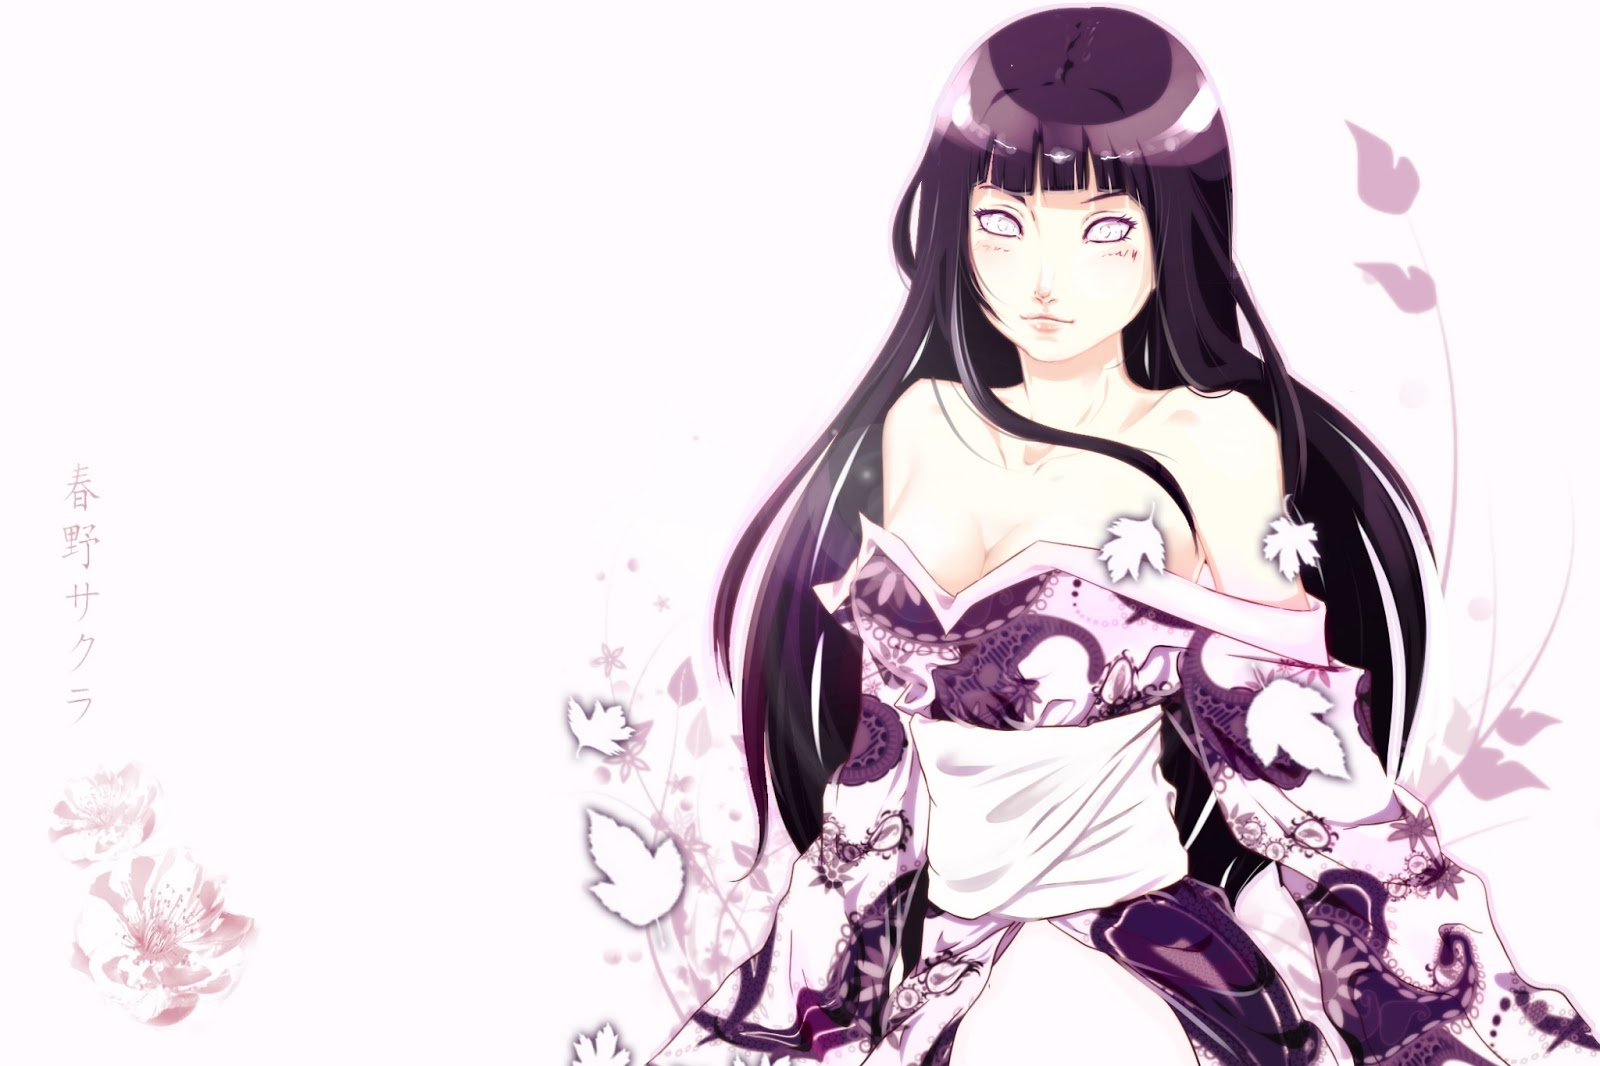 Naruto girls 6 wallpapers your daily anime wallpaper and fan art - Manga naruto shippuden ...